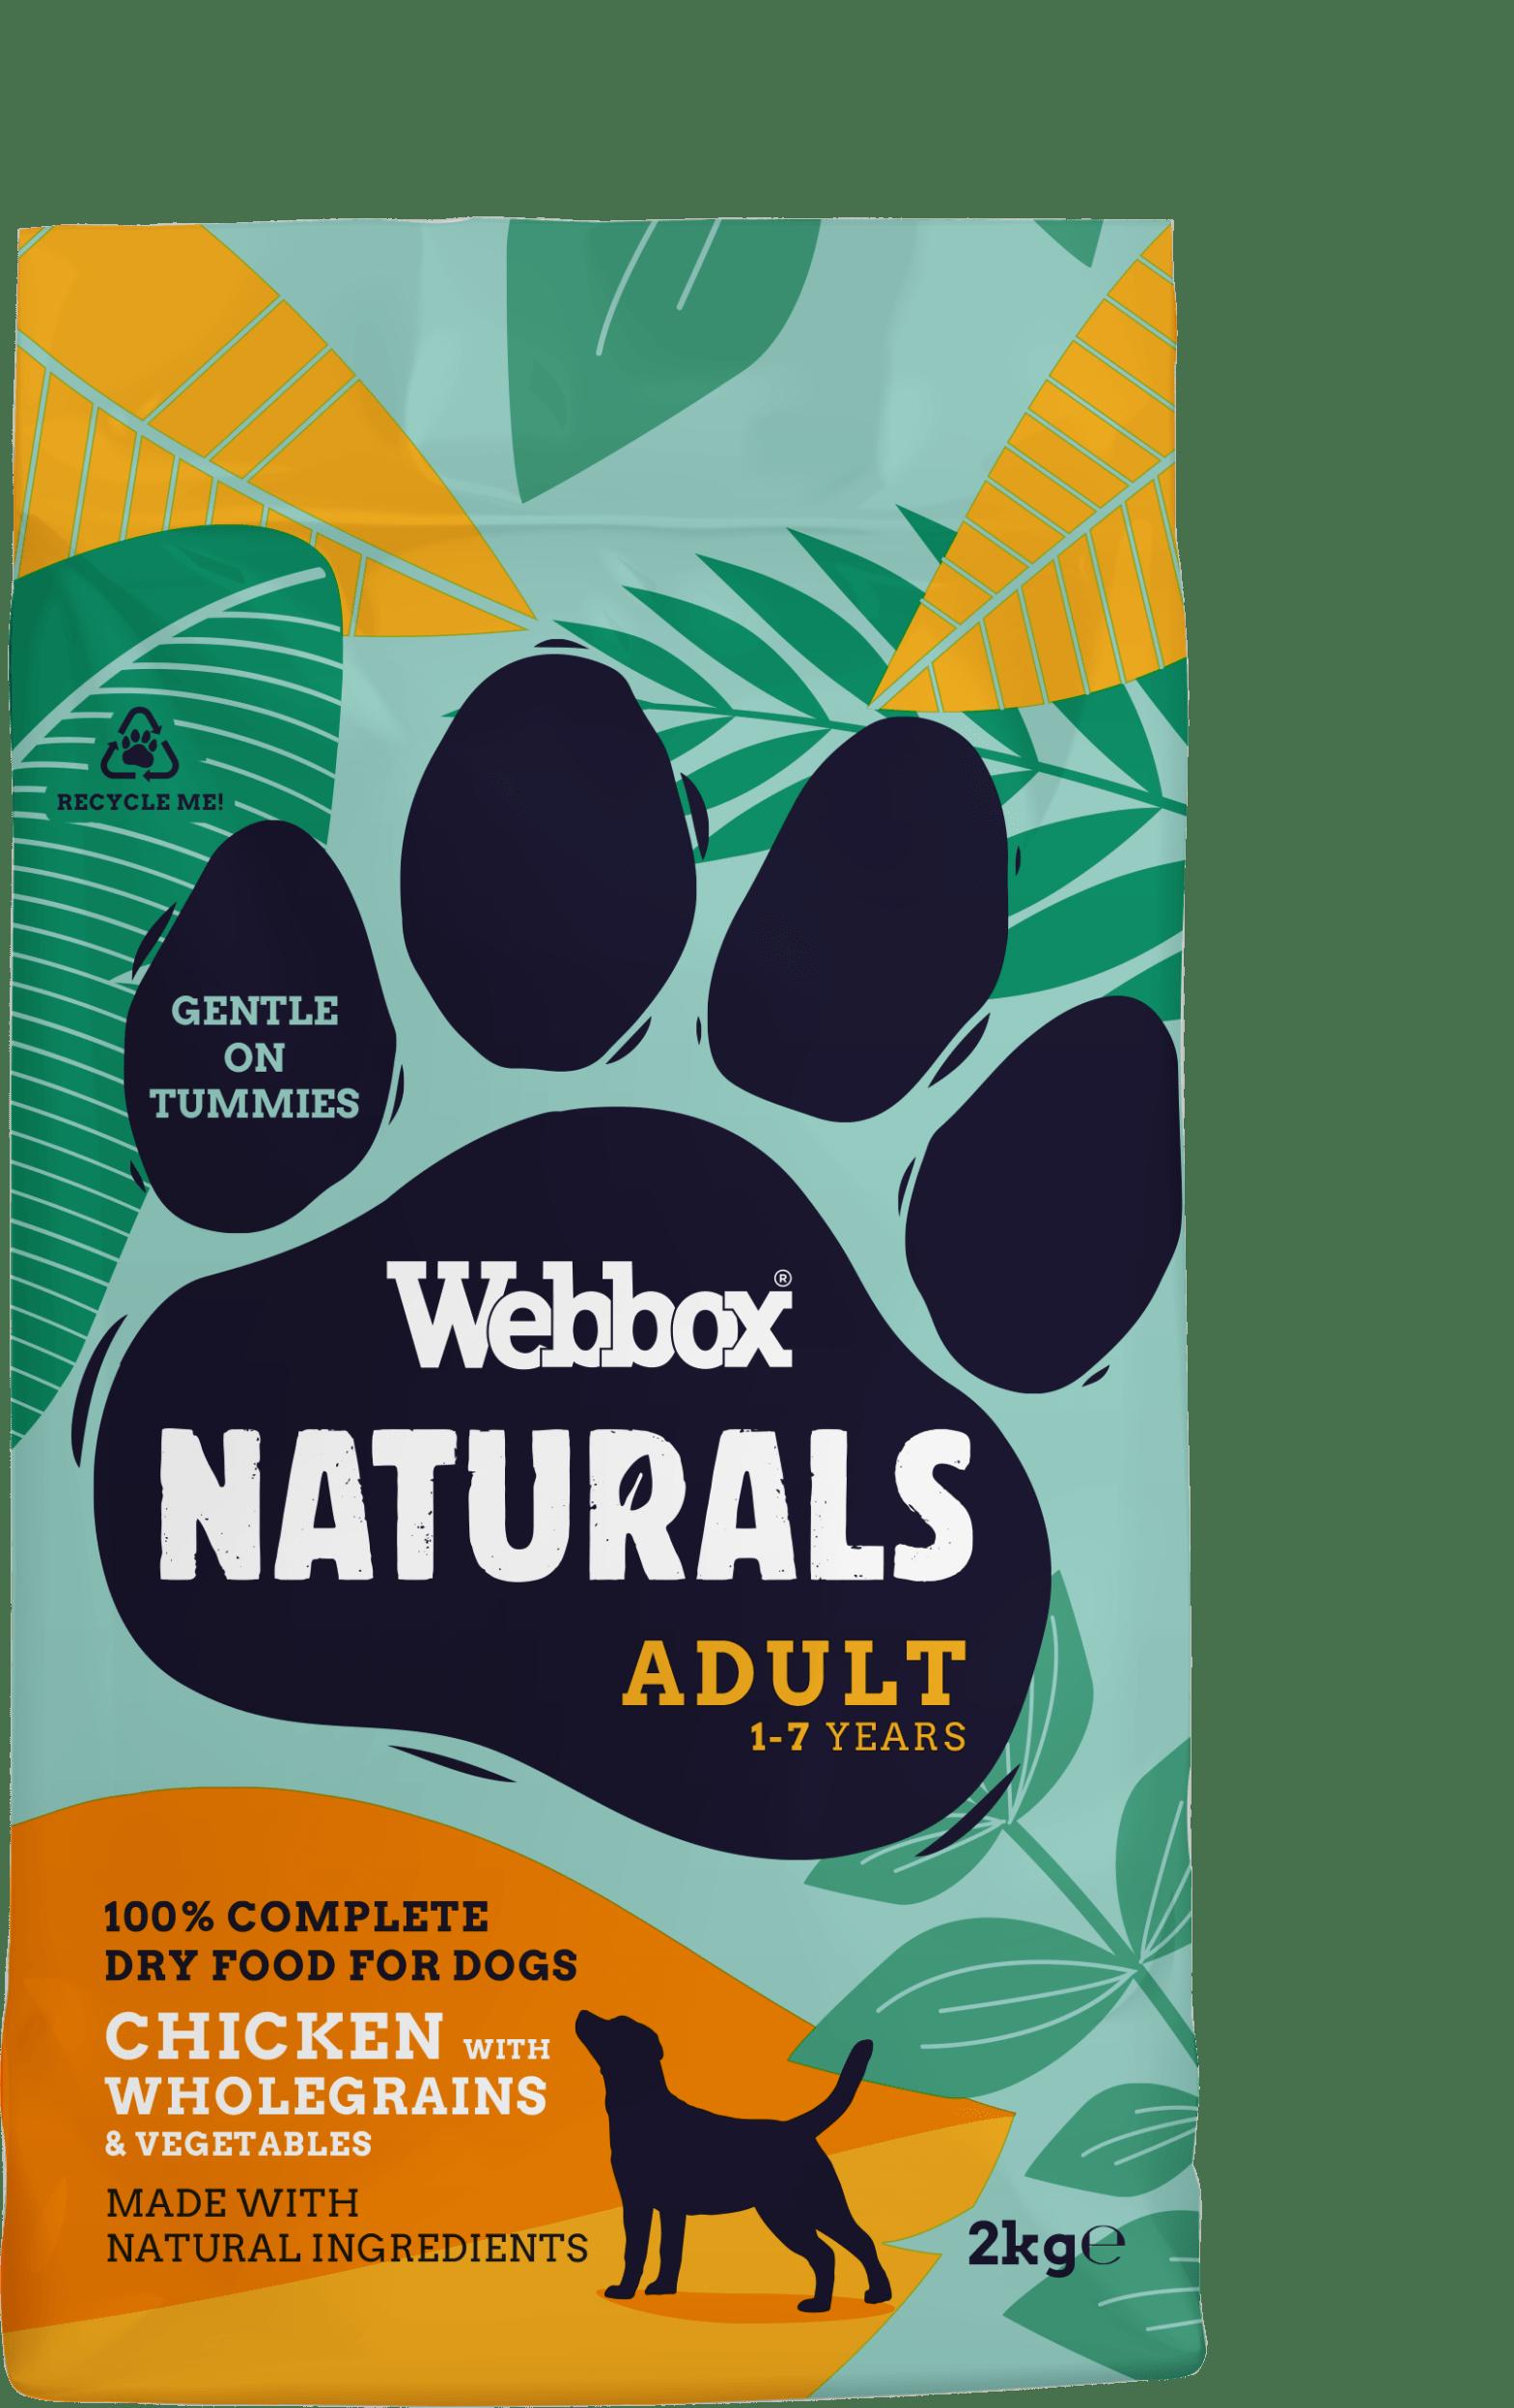 Webbox Naturals Chicken with Wholegrains Dry Dog Food